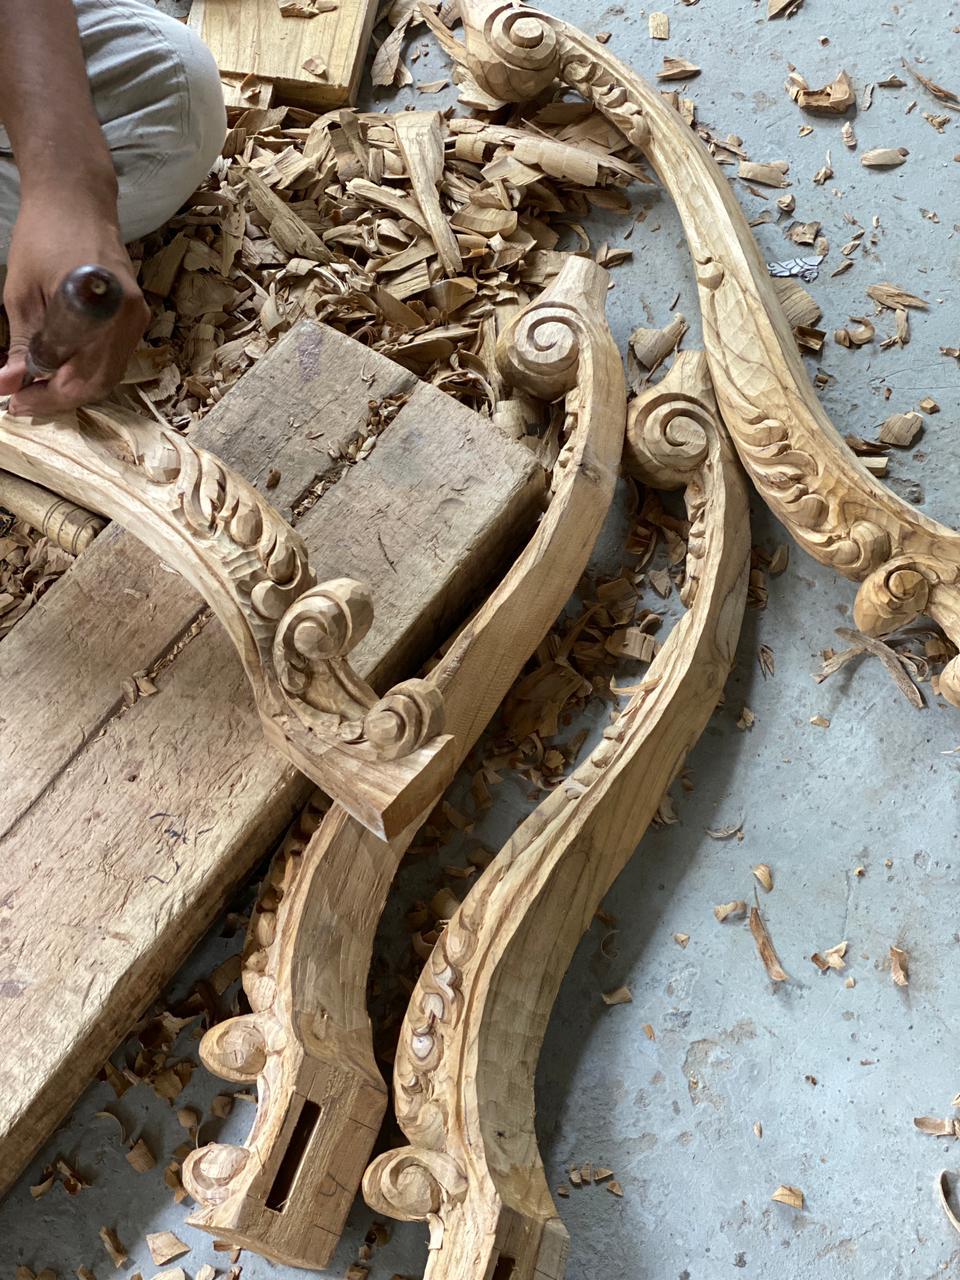 Teak wood seasoning wood carving skills joining turning